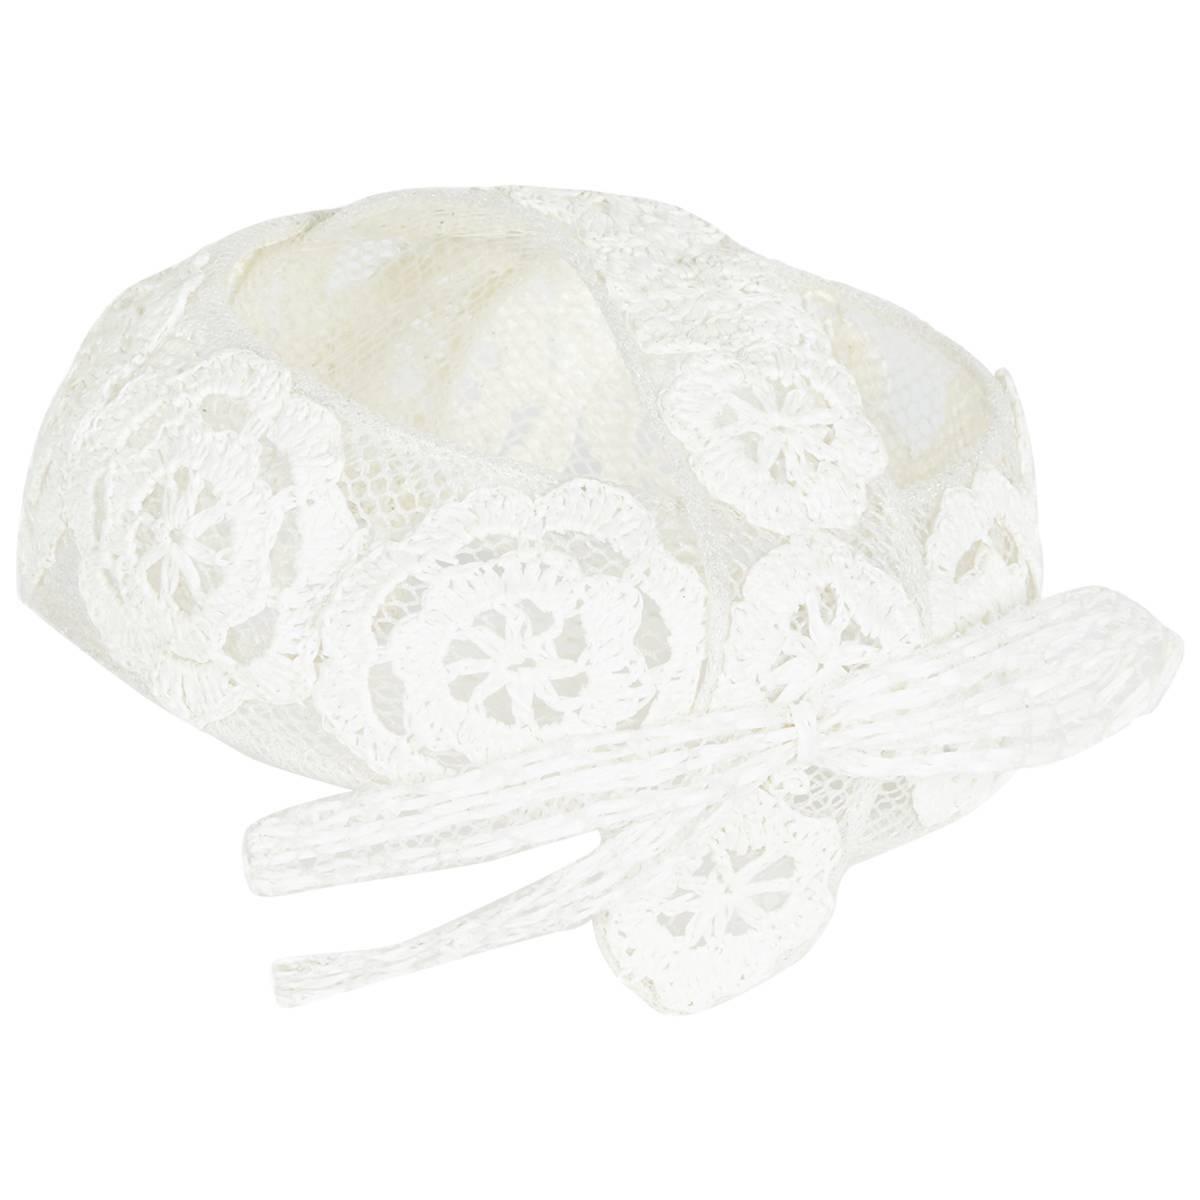 1960s Italian White Raffia Bridal Cap With Floral Design